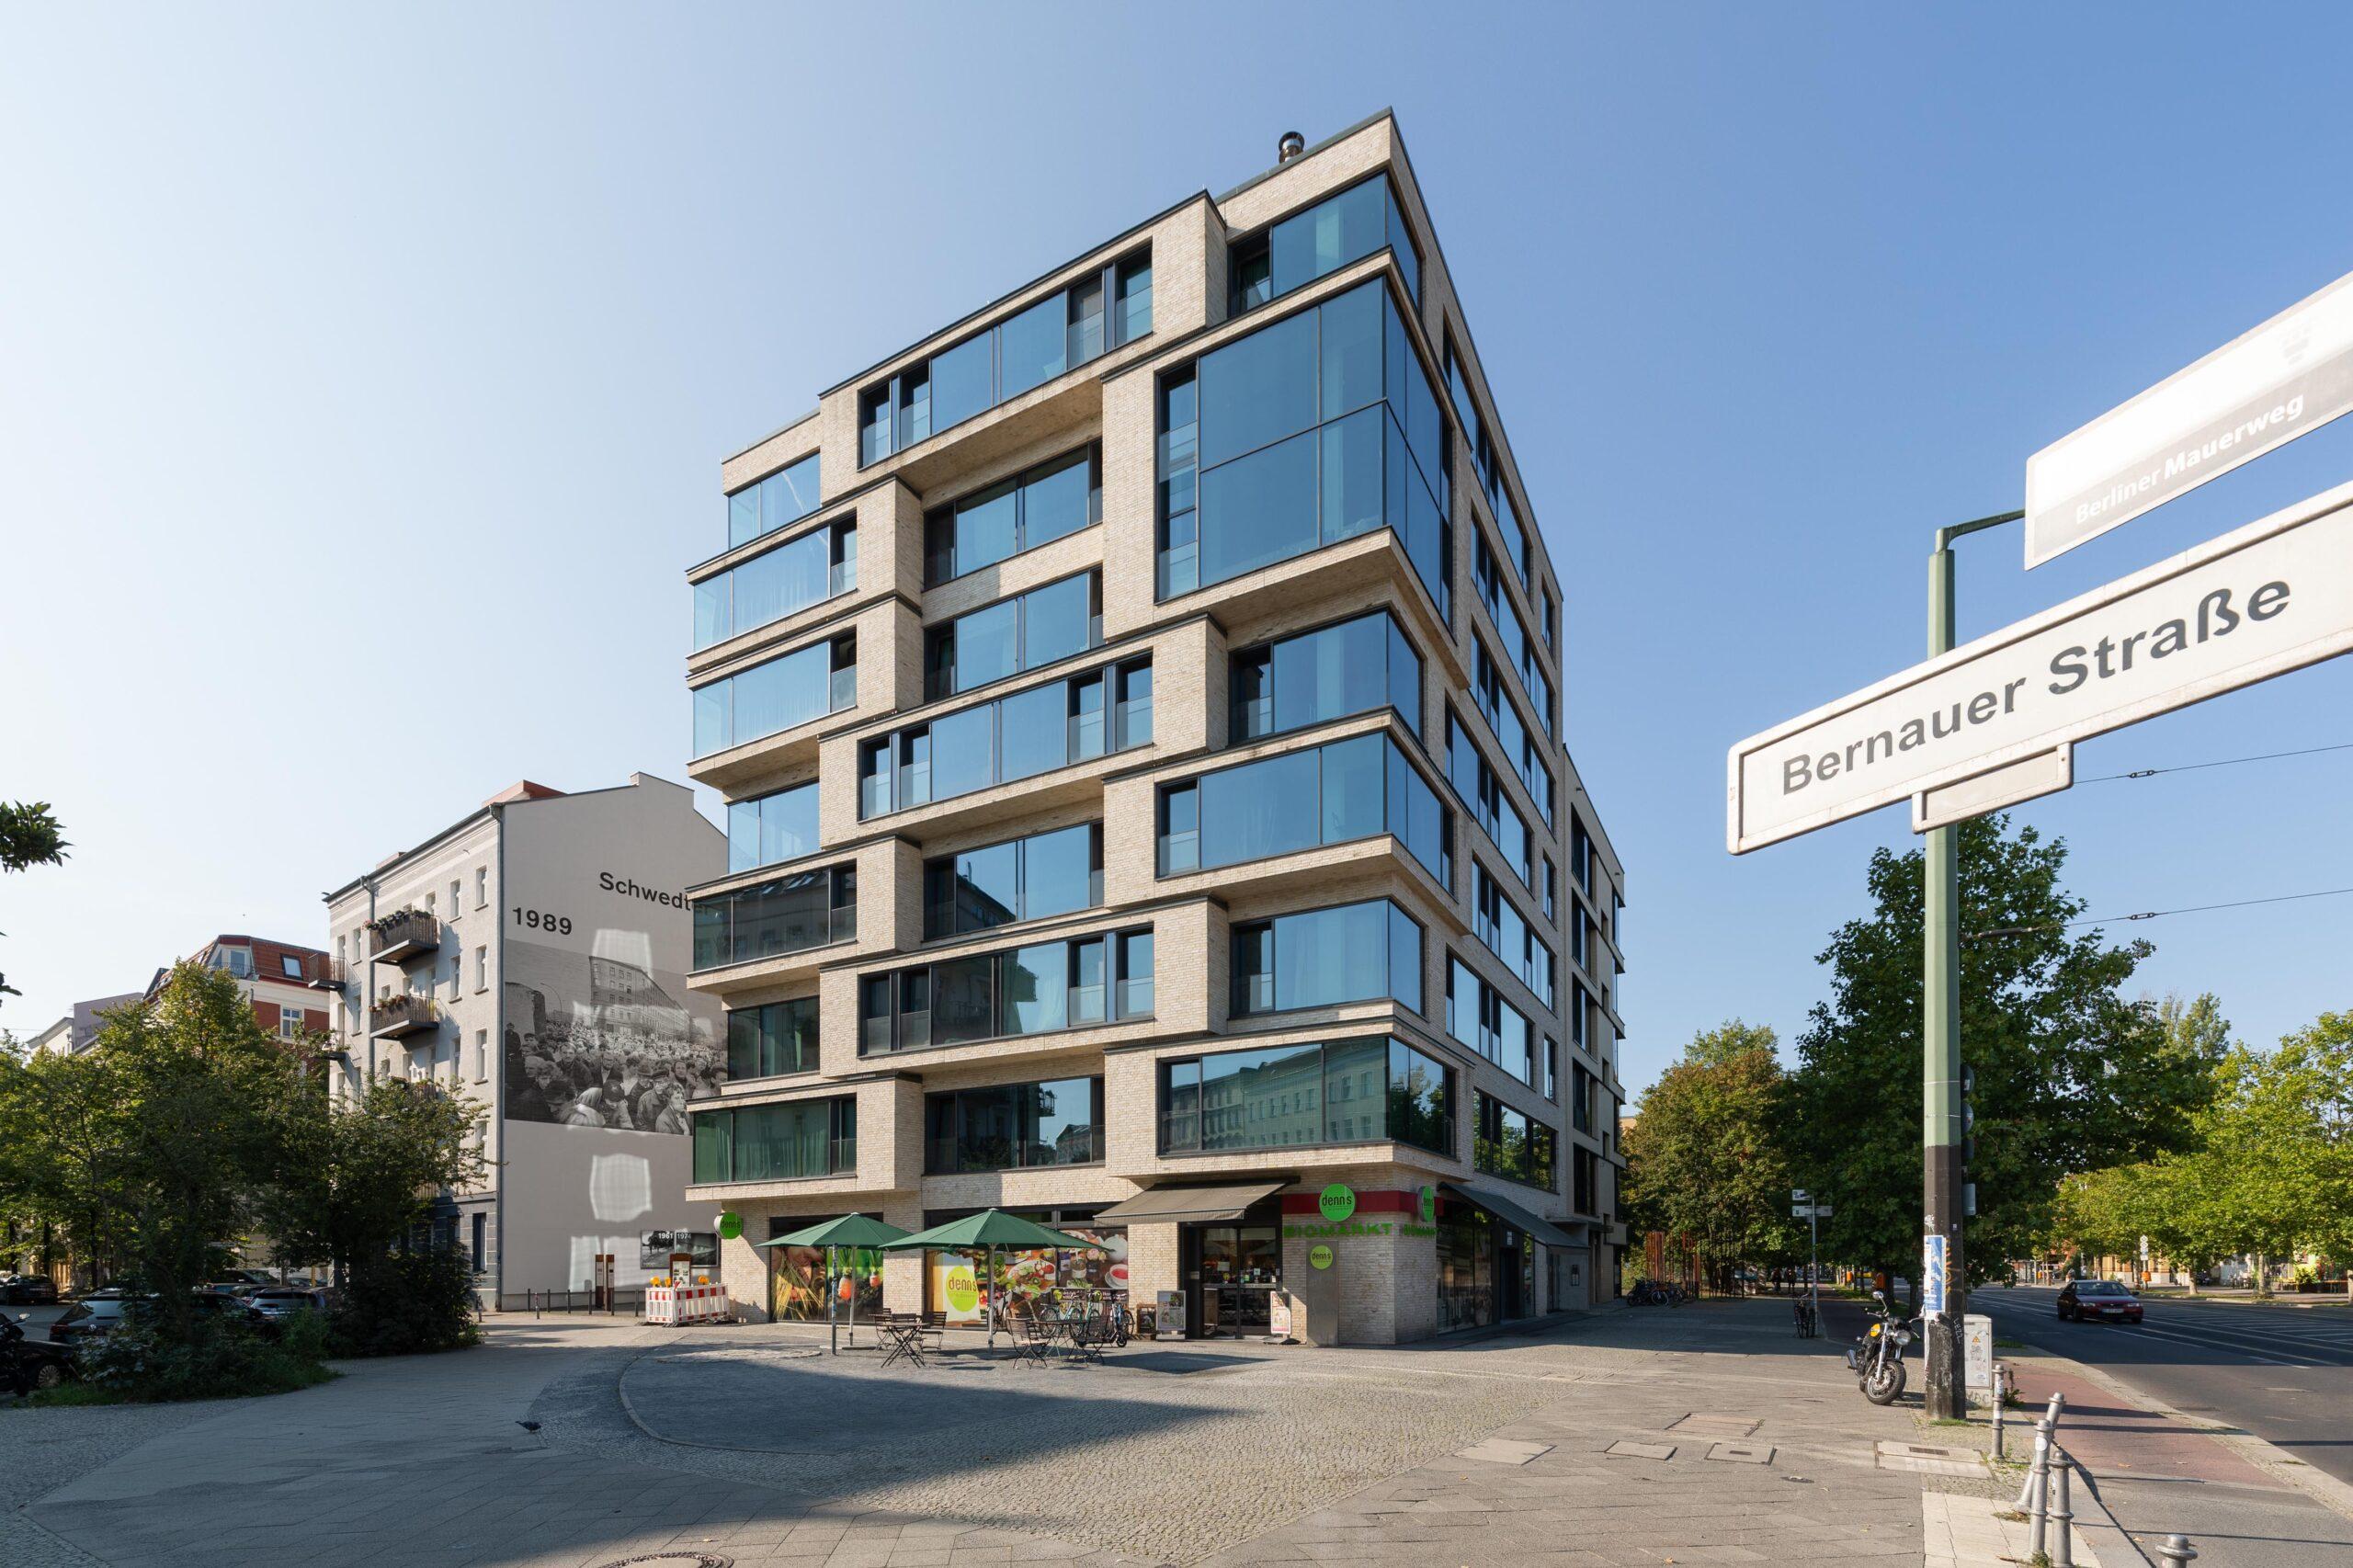 Bernauer Str. WEB-1